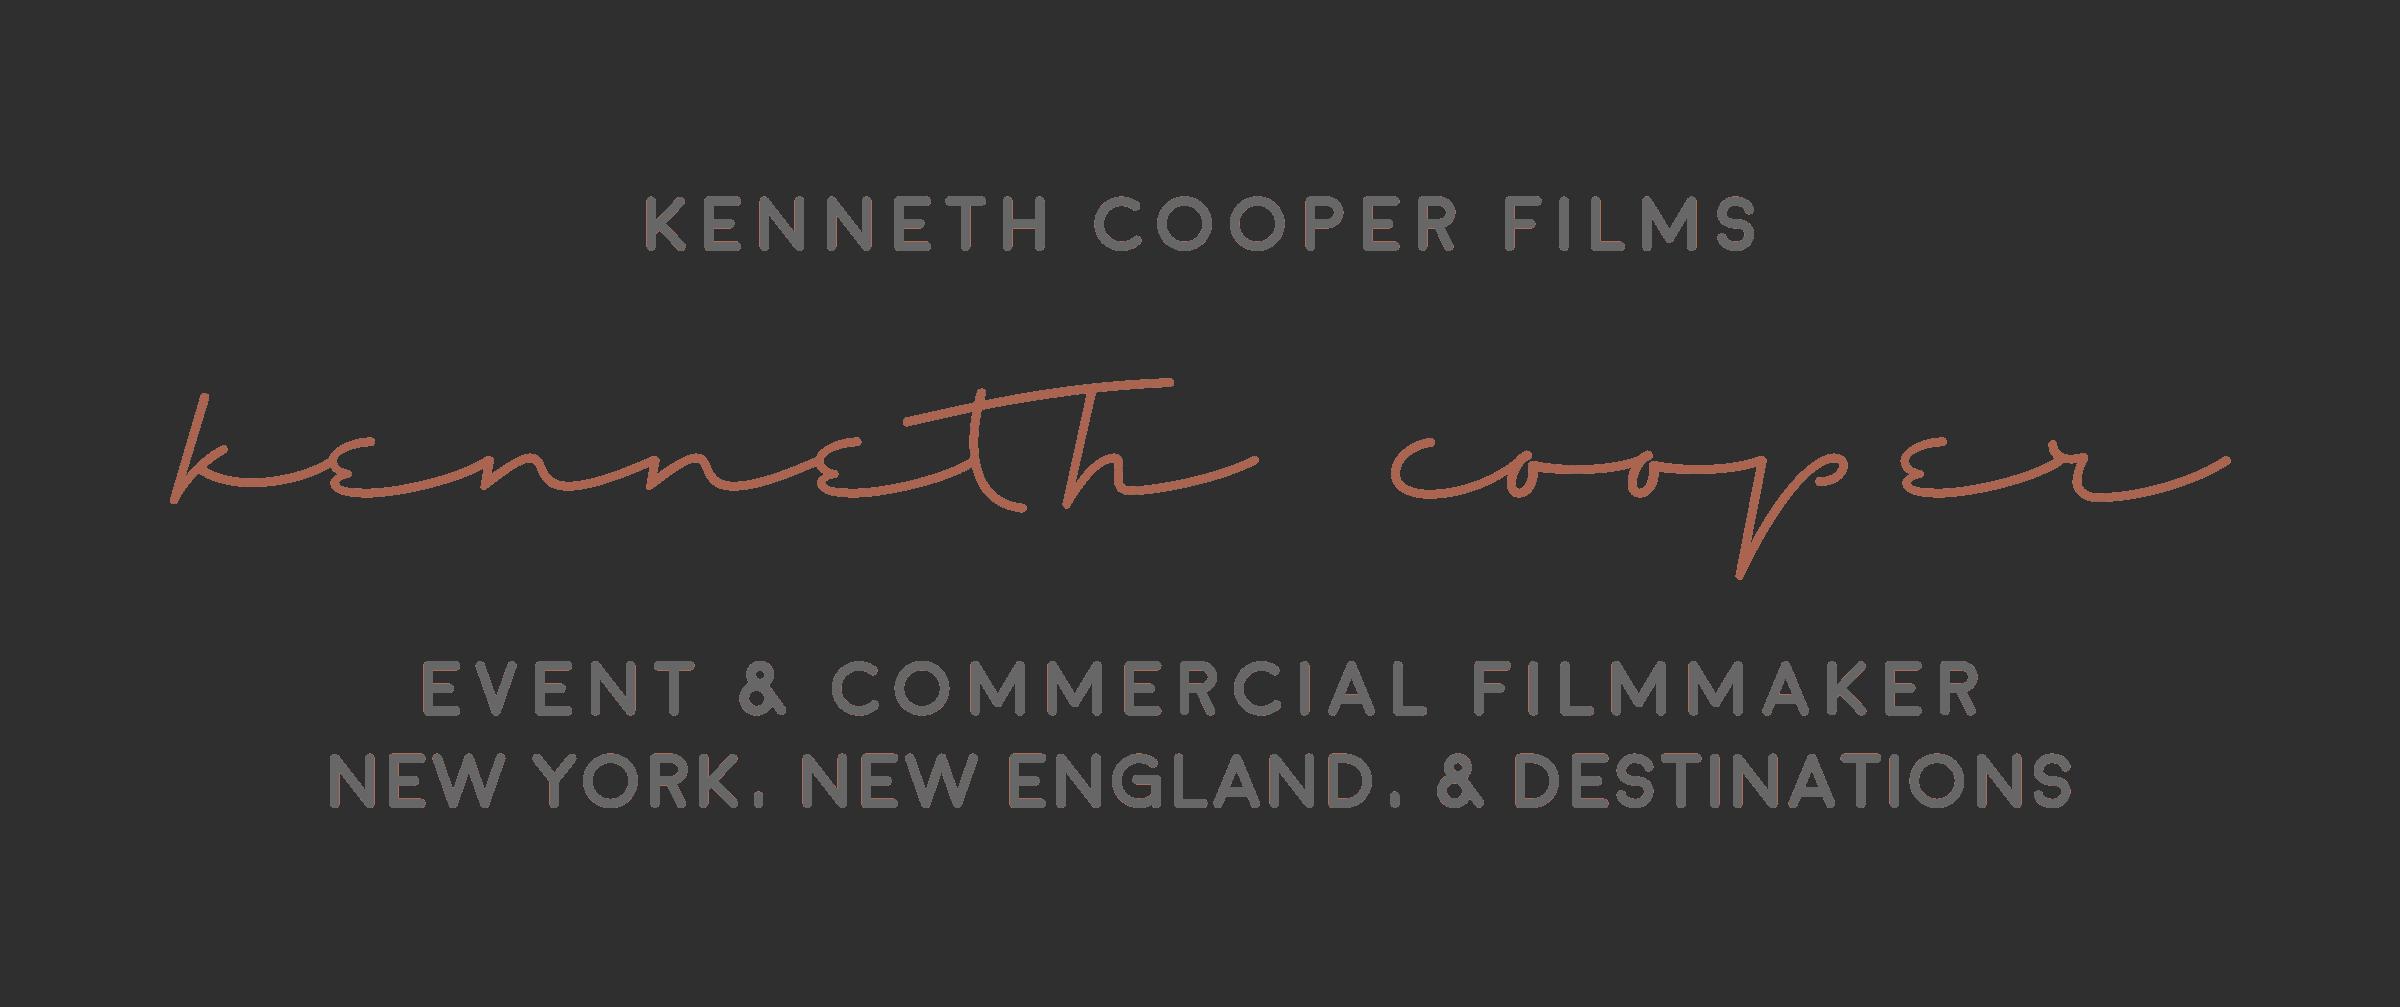 kenneth cooper films cinematography new york worldwide